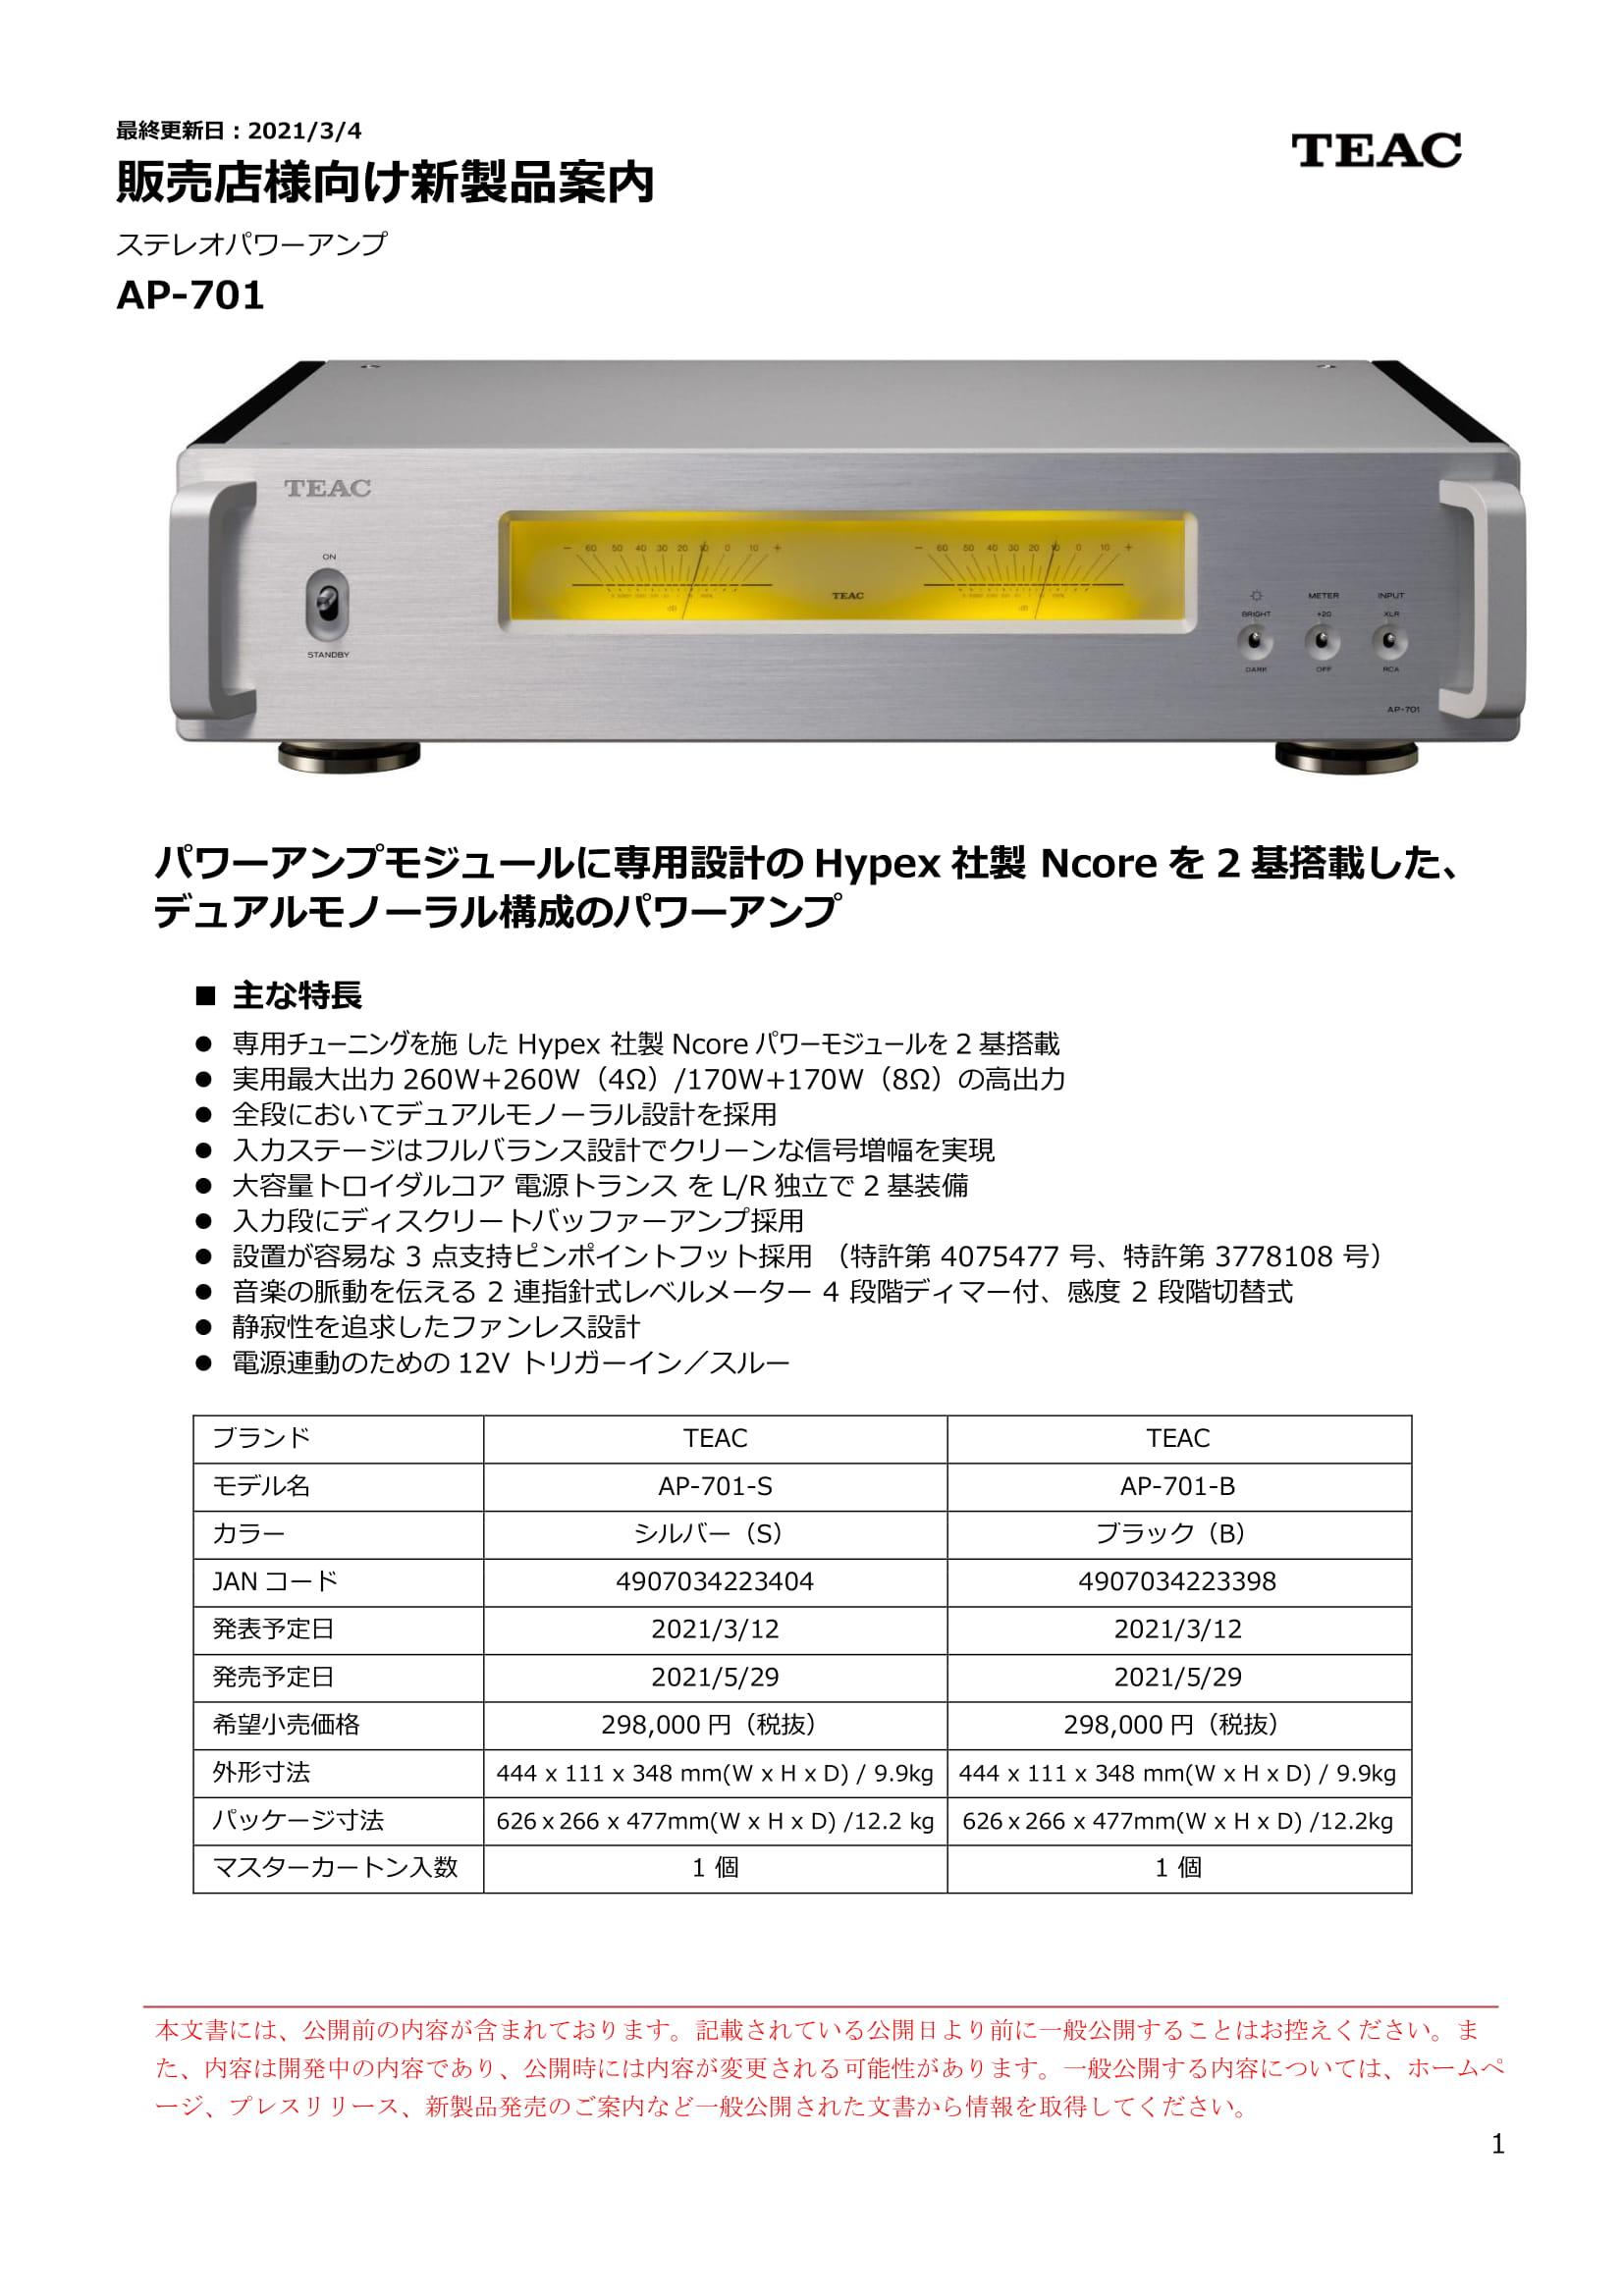 AP-701_SNPI_210304-1.jpg